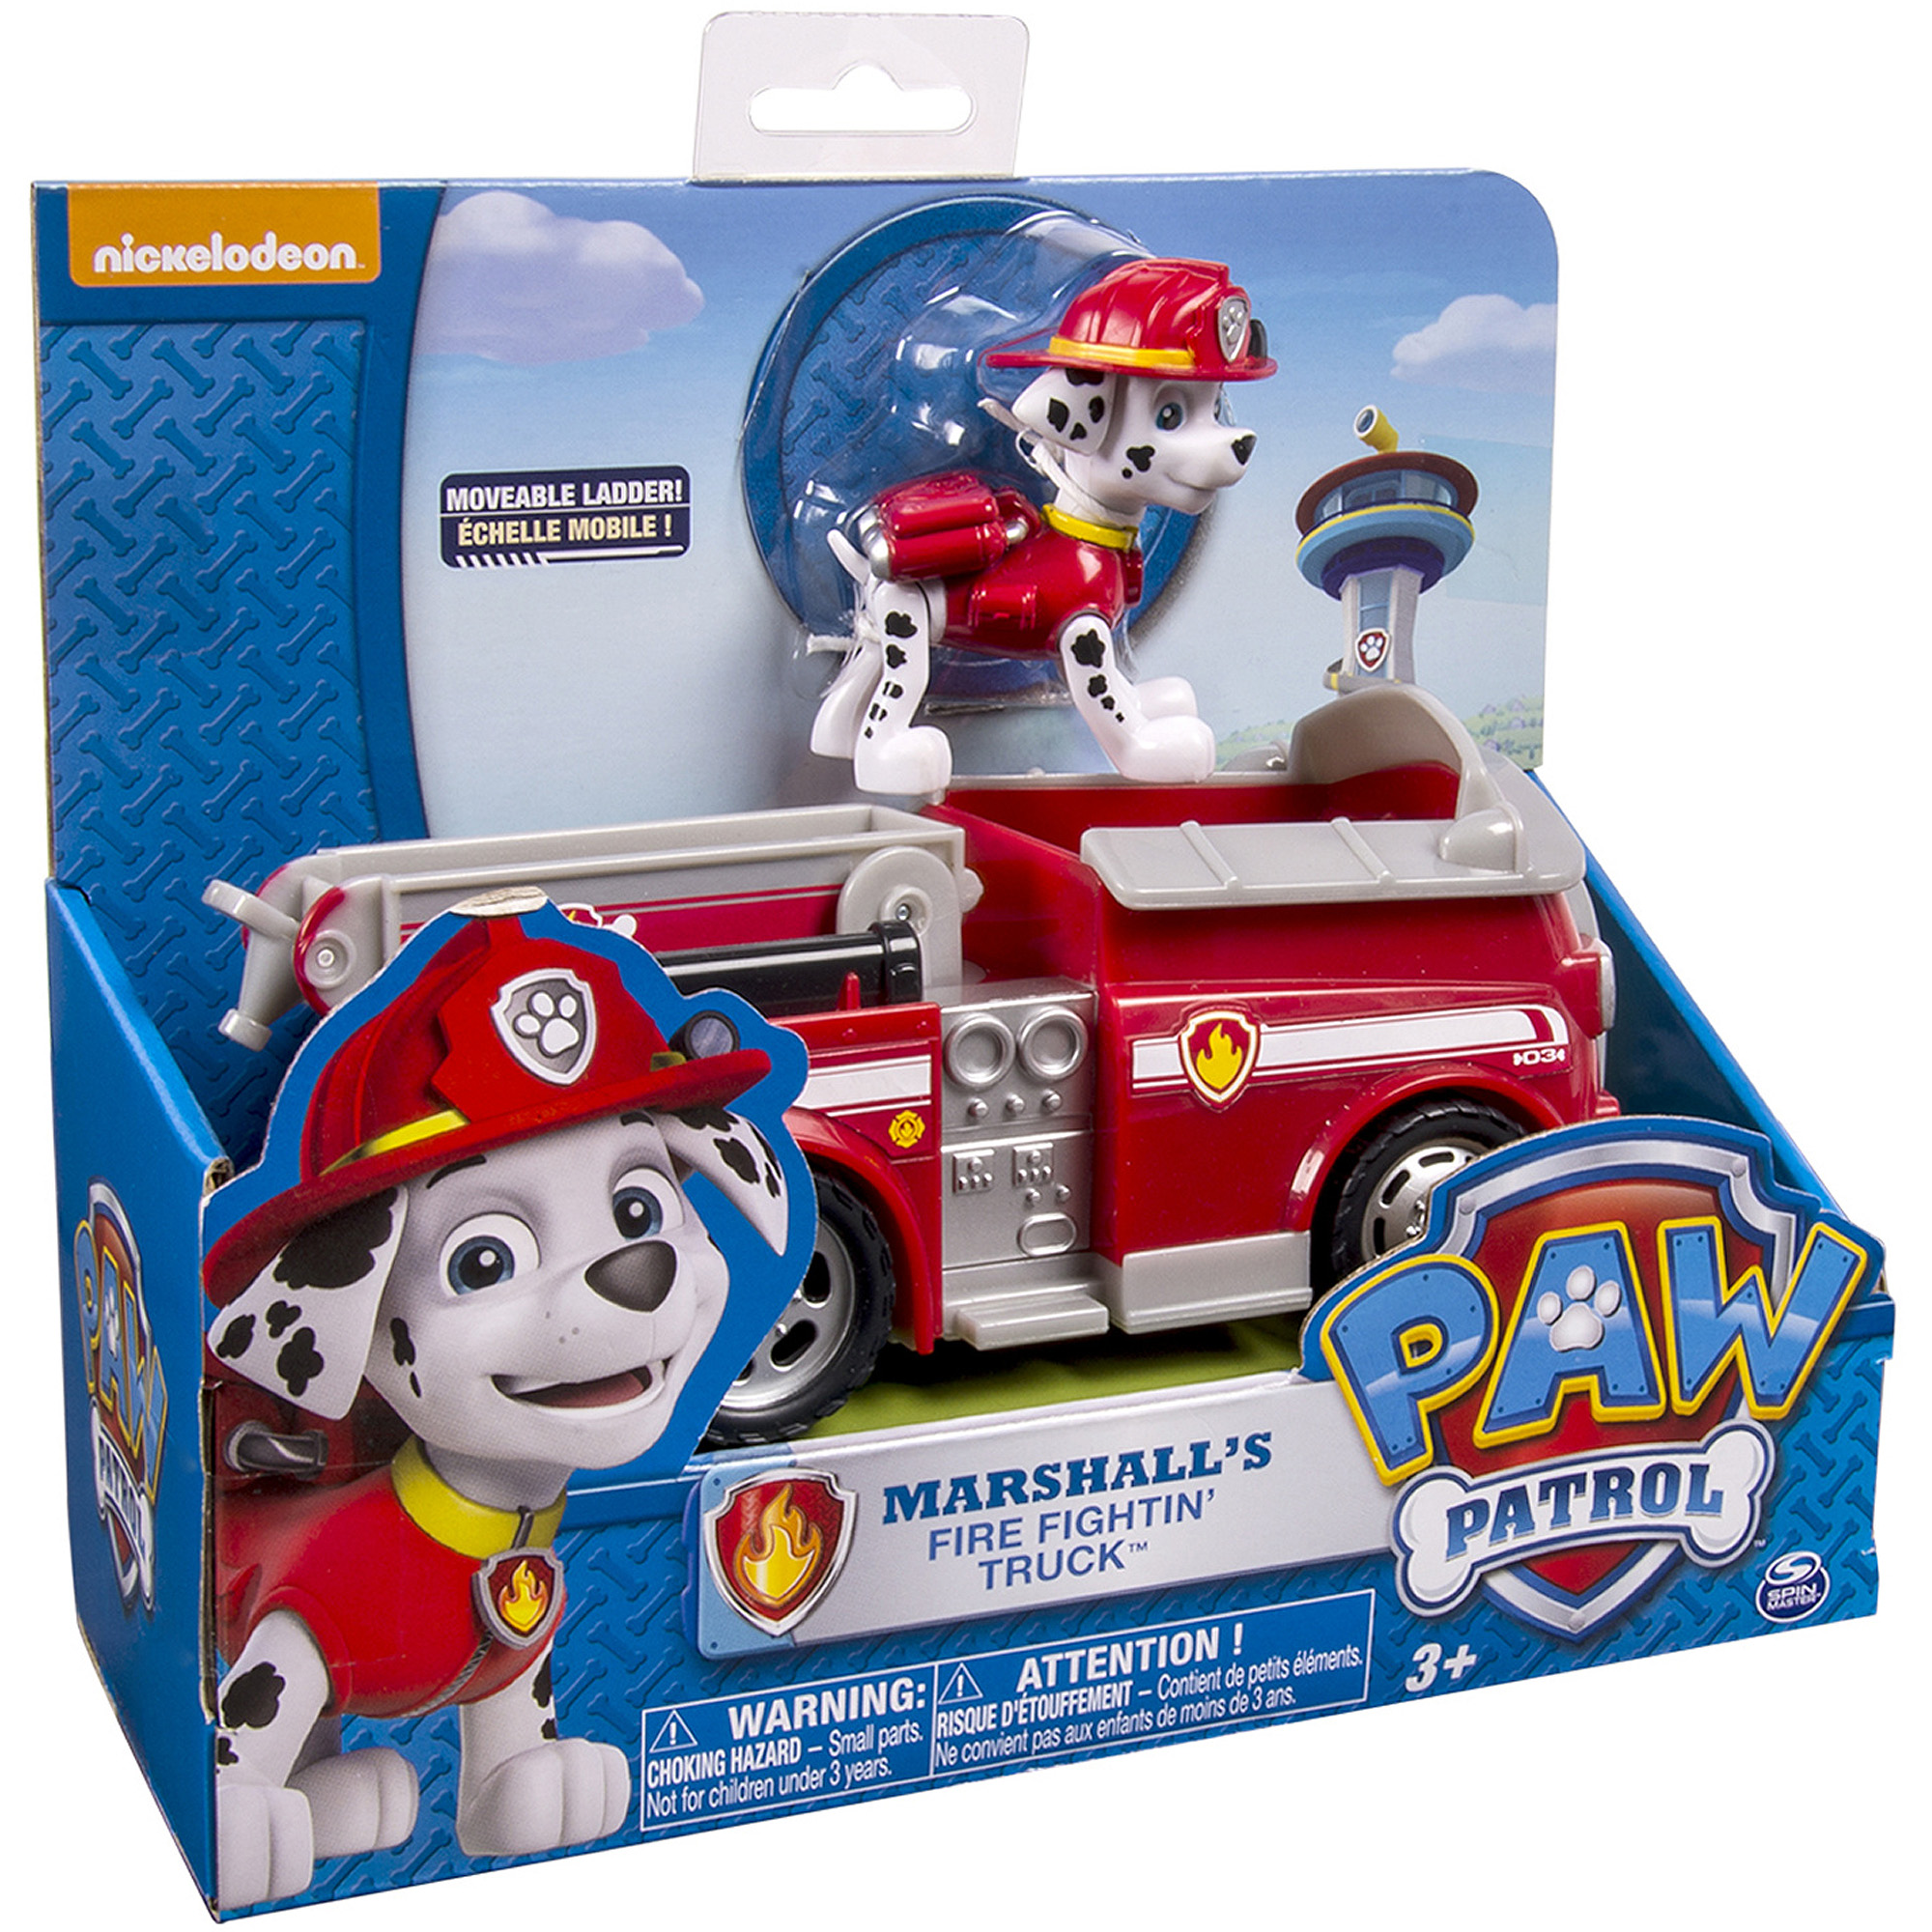 Nickelodeon Paw Patrol - Marshall's Fire Fightin' Truck, Vehicle and Figure